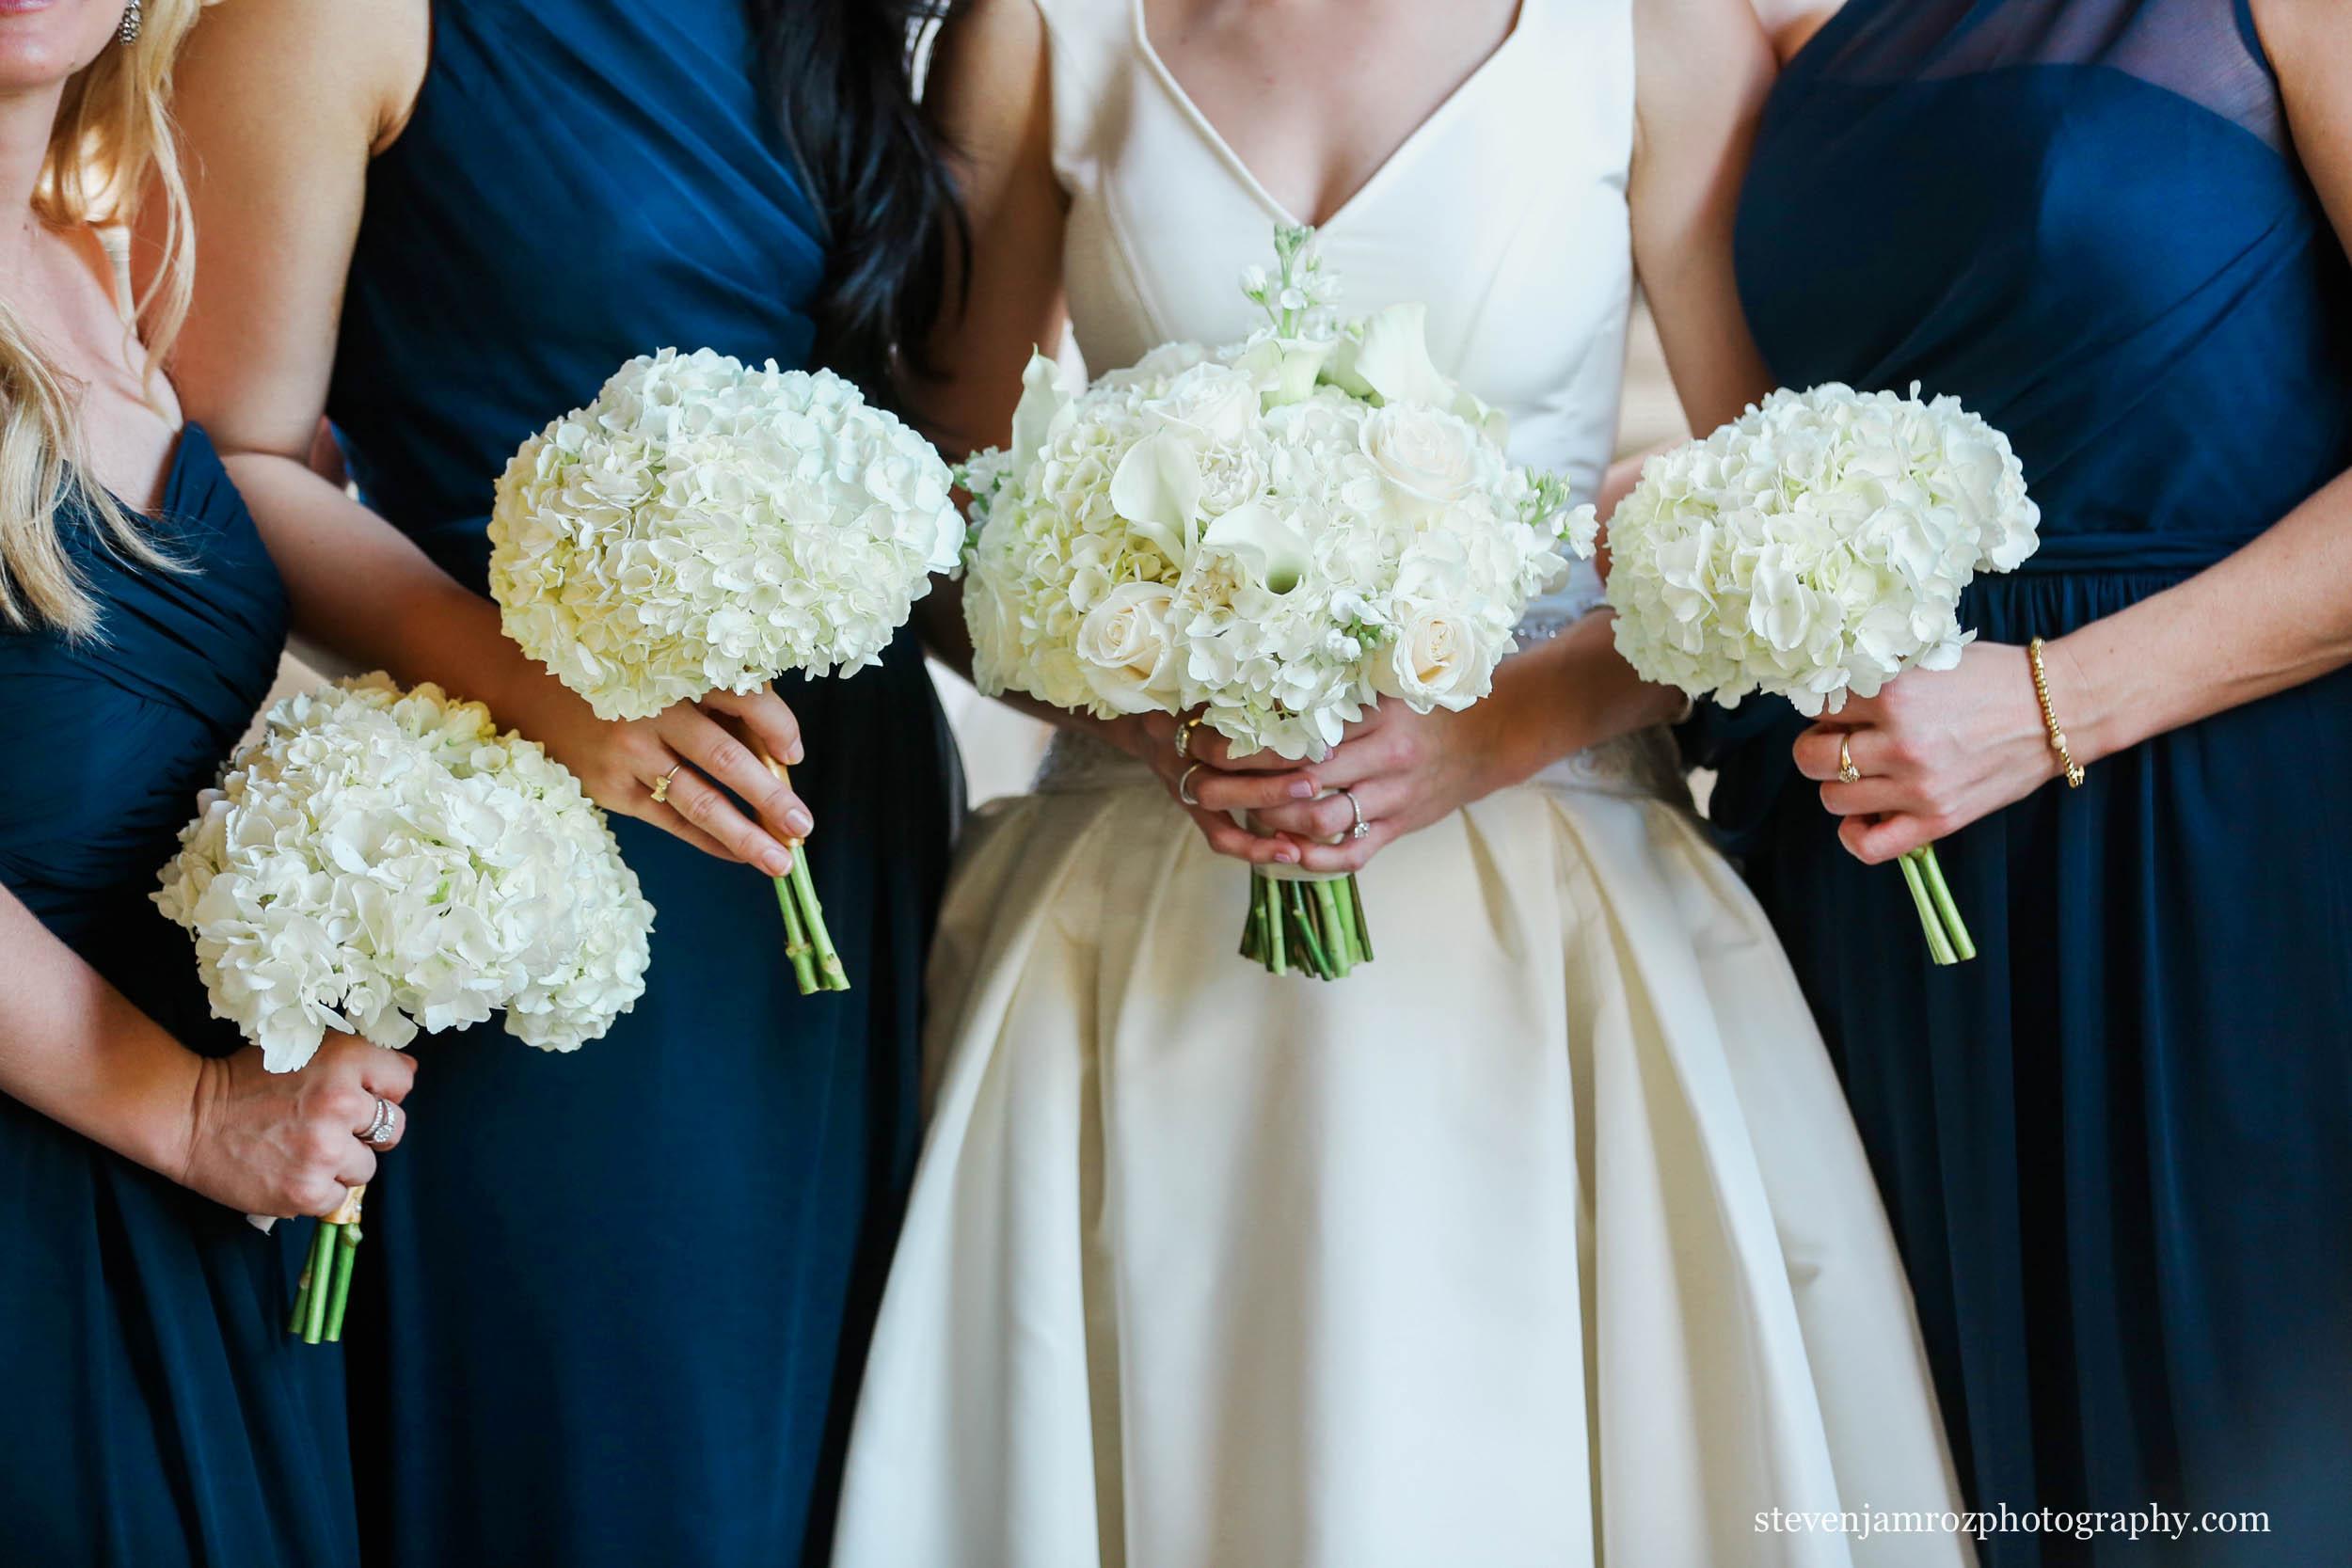 blue-dresses-flowers-wedding-steven-jamroz-photography-0466.jpg